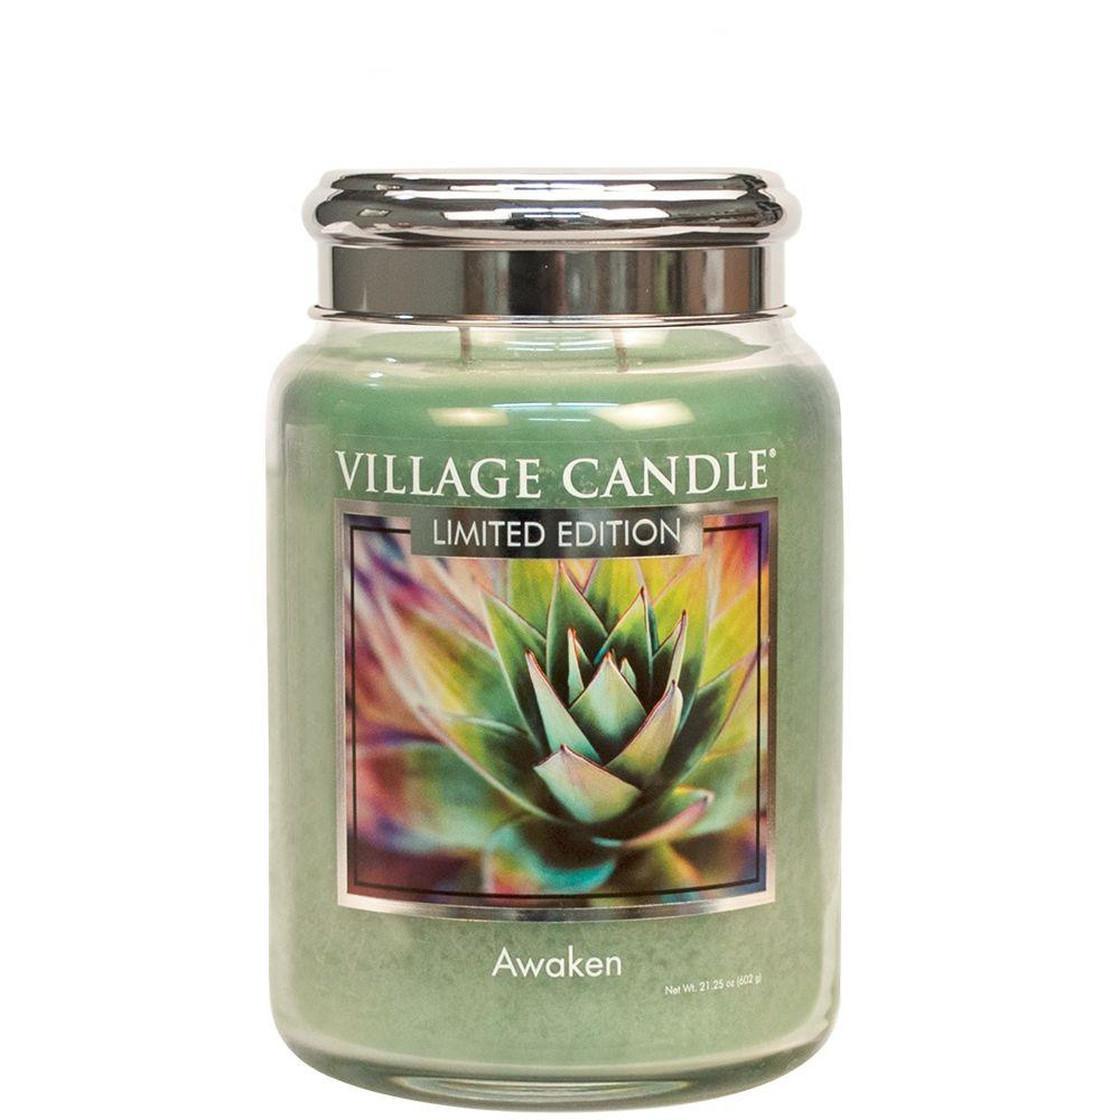 VILLAGE CANDLE Svíčka Village Candle - Awaken 602g, zelená barva, sklo